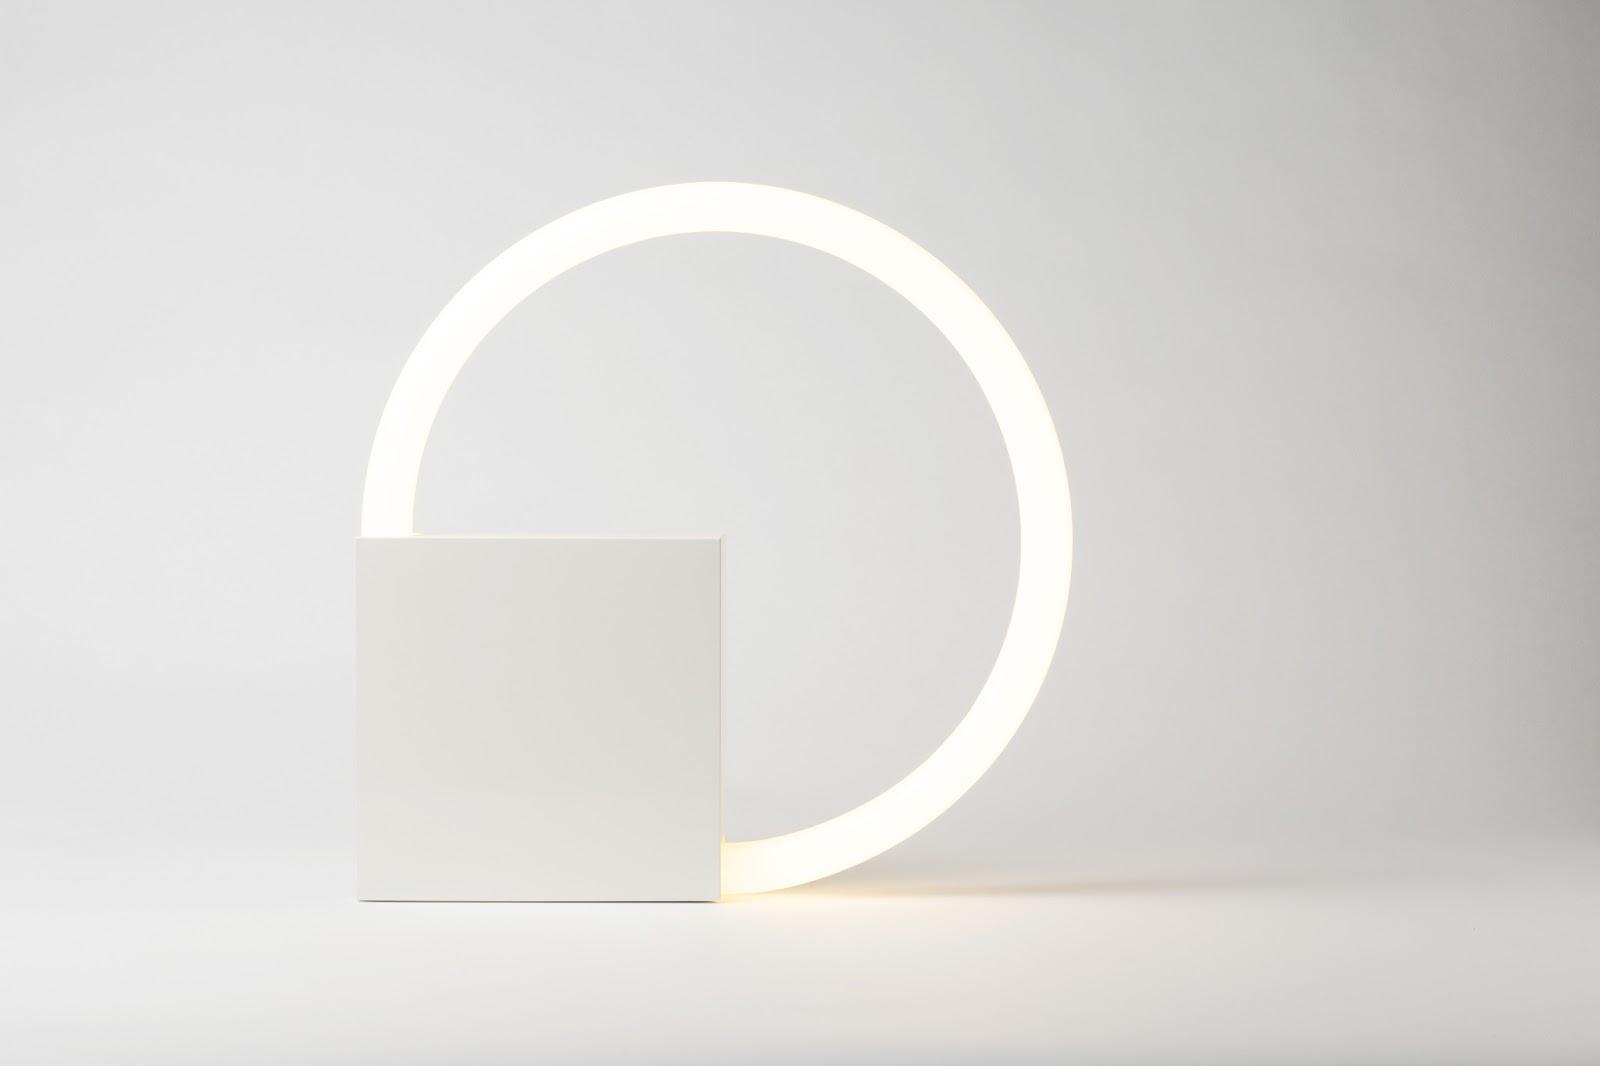 Design Keuken Lamp : modern interior design TC 6™ Contemporary Modern Lamp